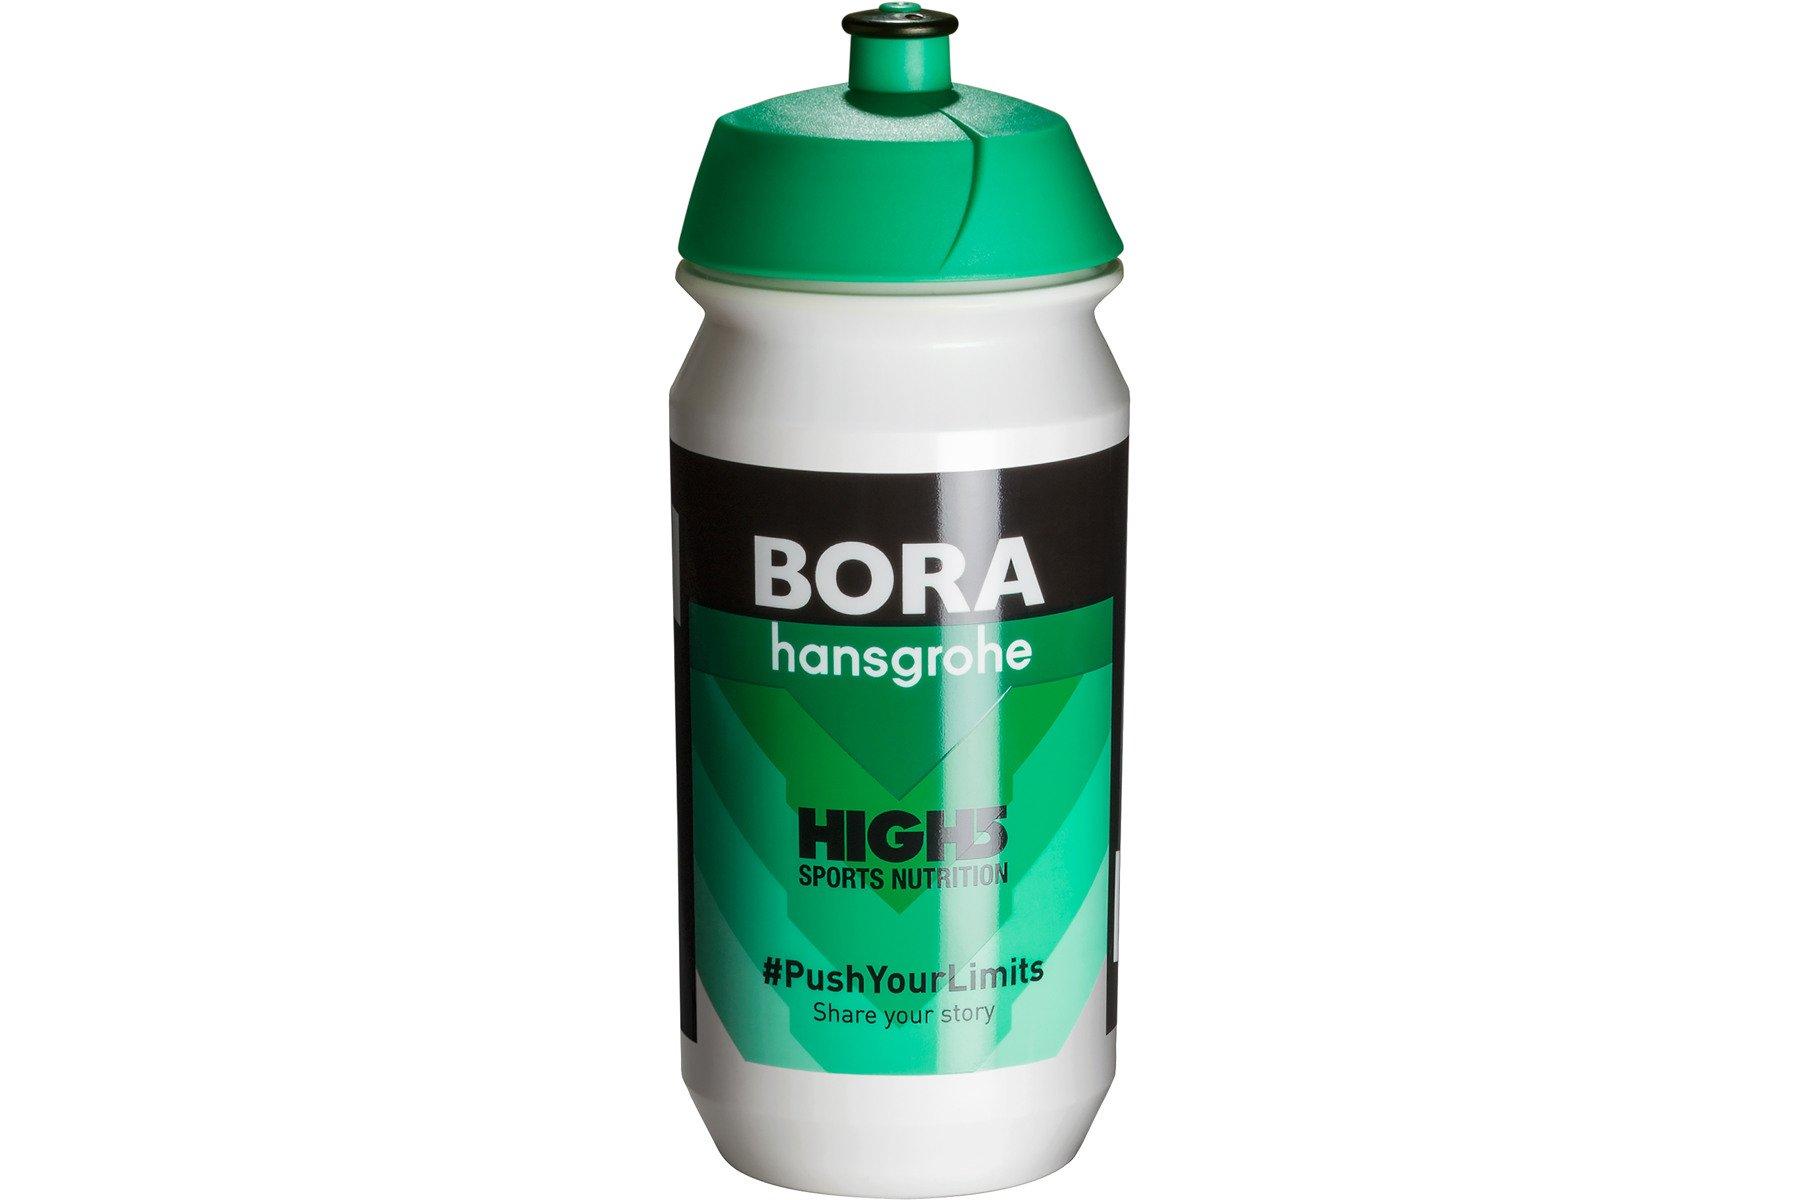 Tacx Bora Hansgrohe 2018 flaske